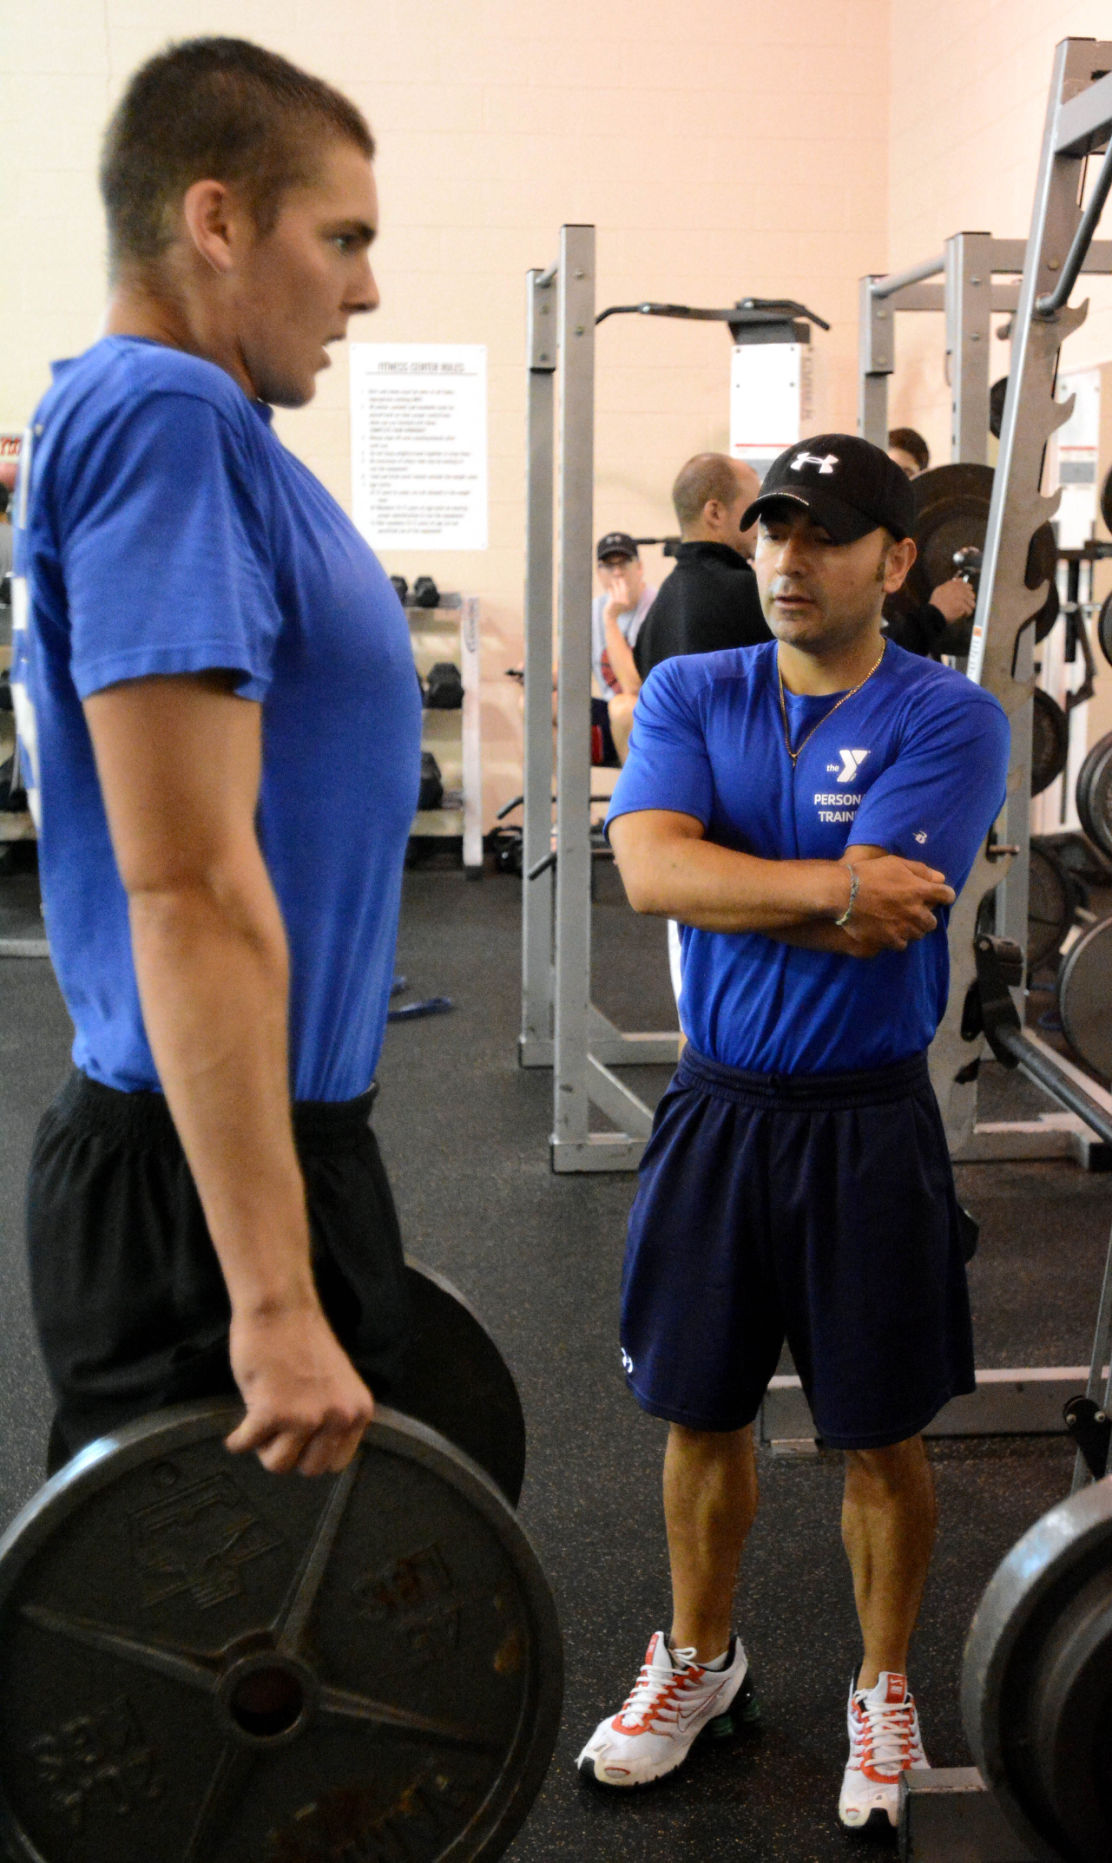 Doctor prescribed weight loss programs